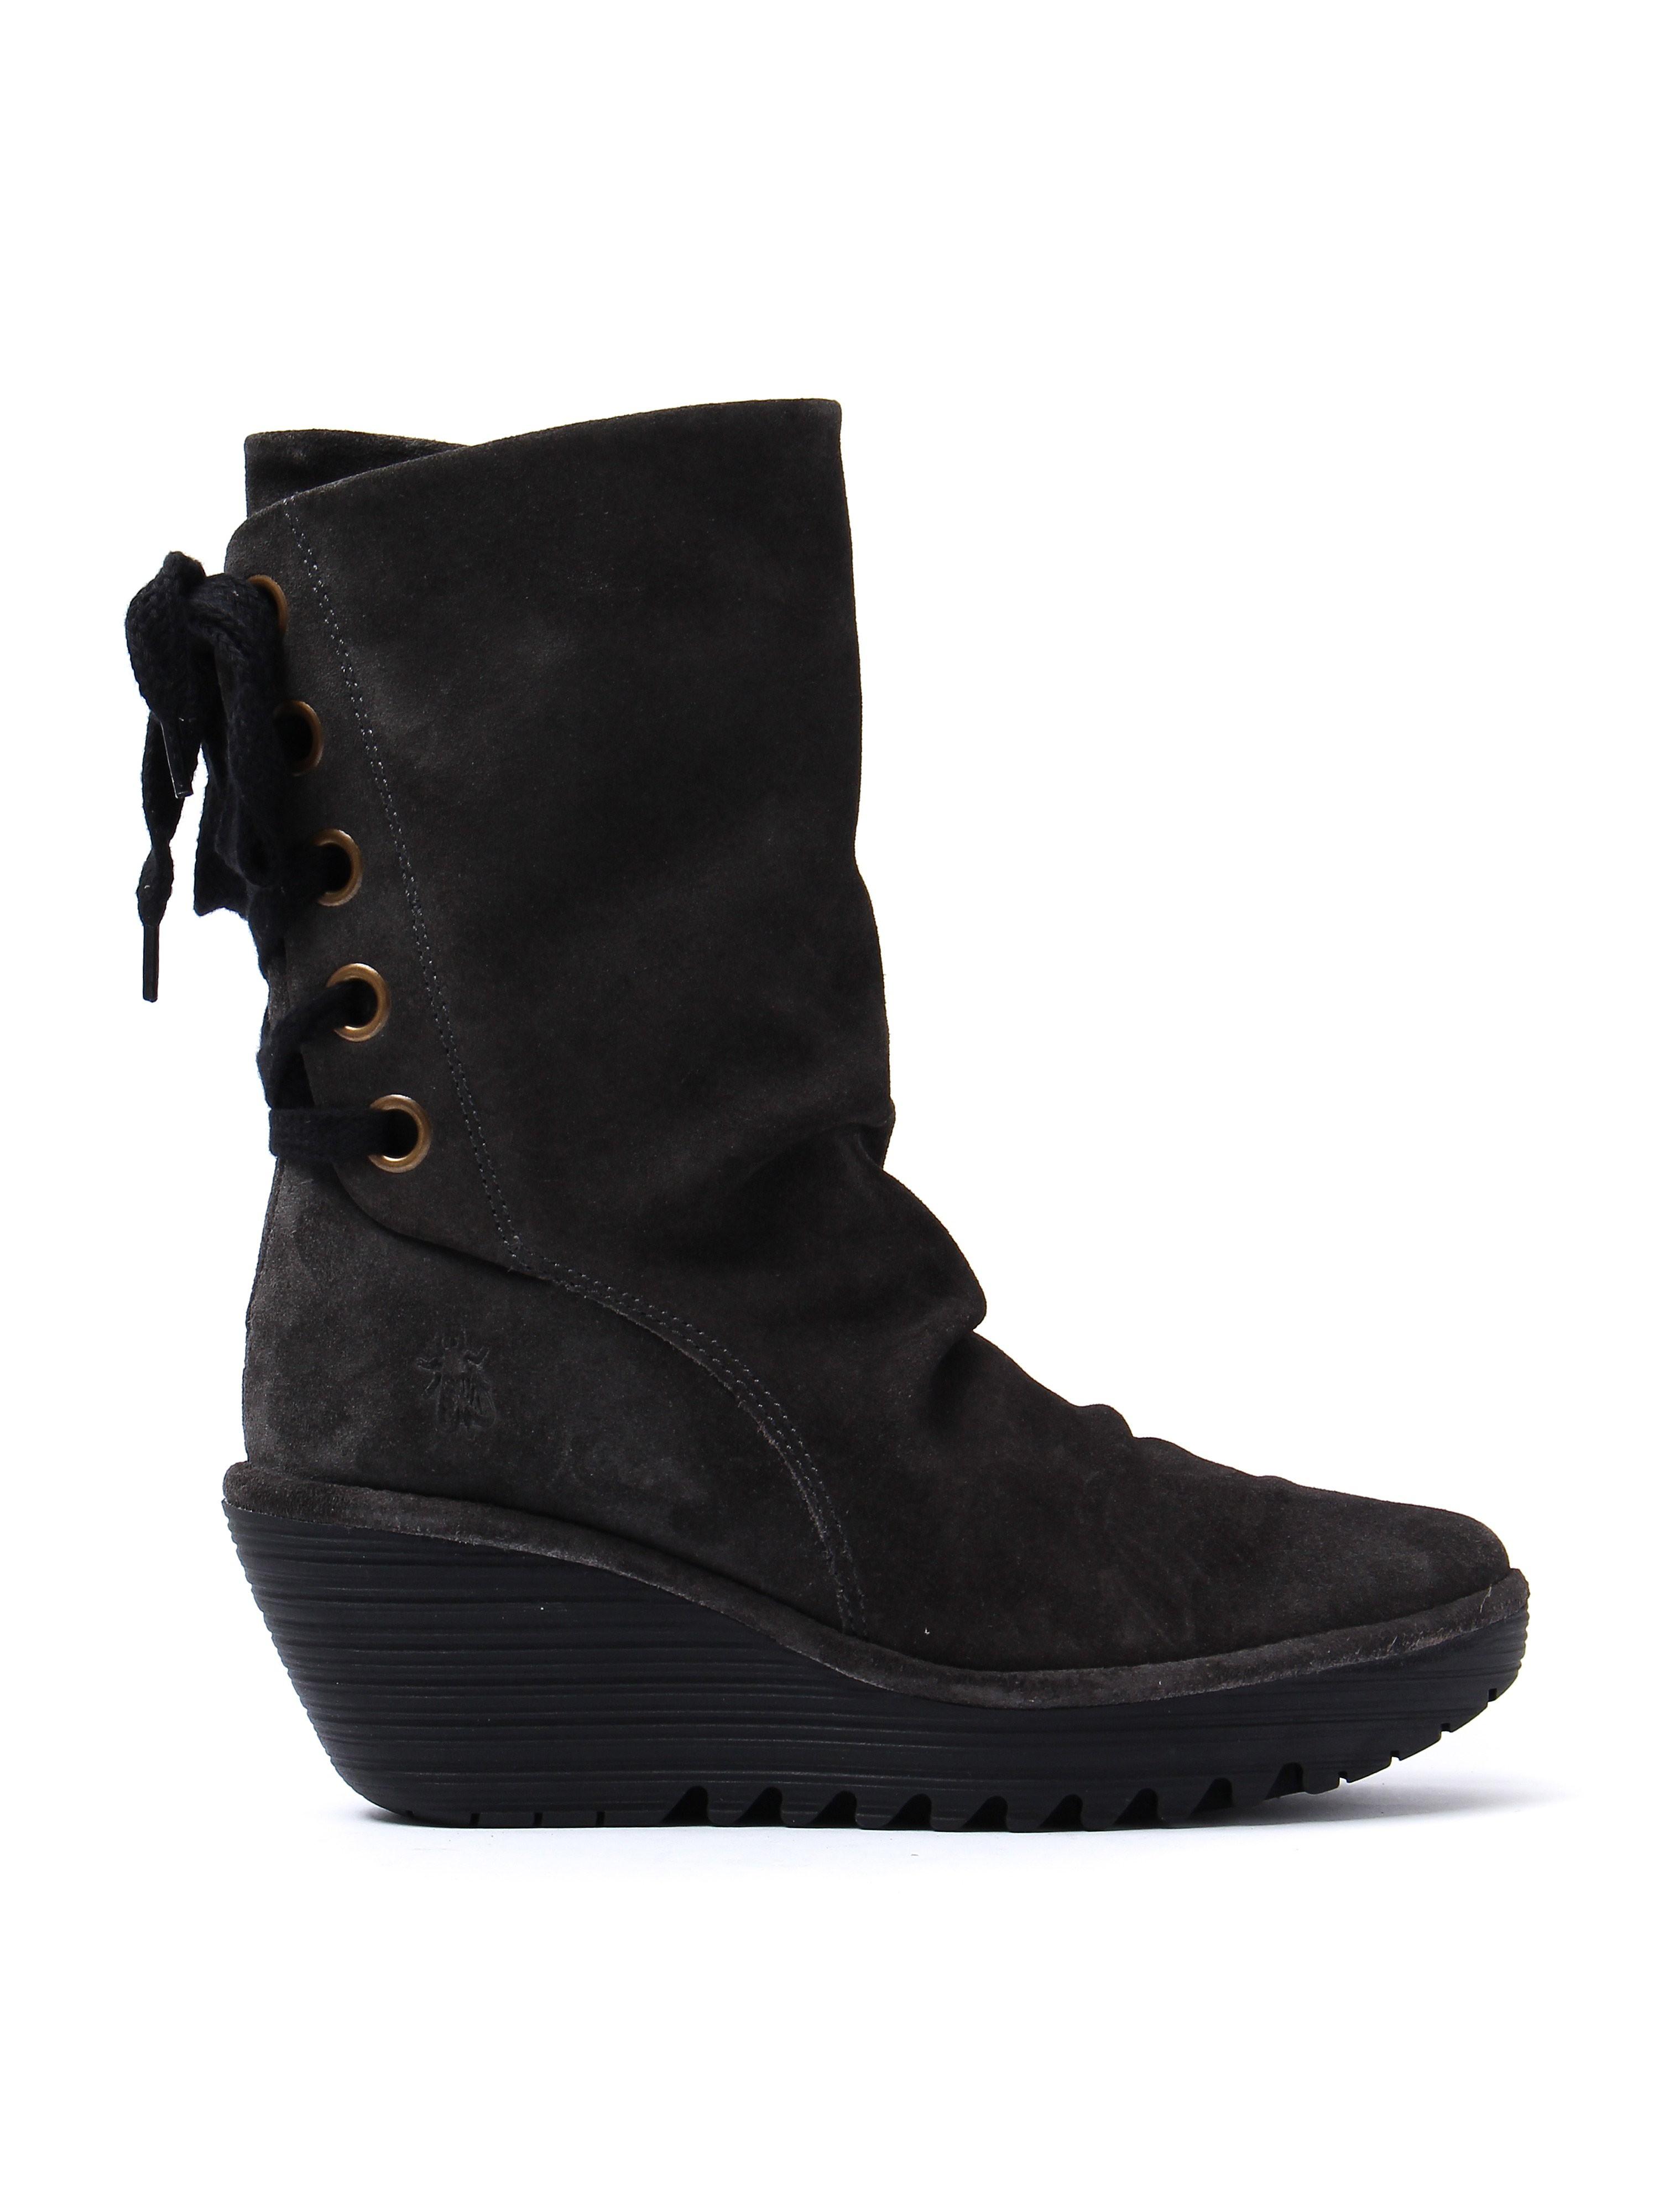 Fly London Women's Yada Tall Boots - Diesel Suede